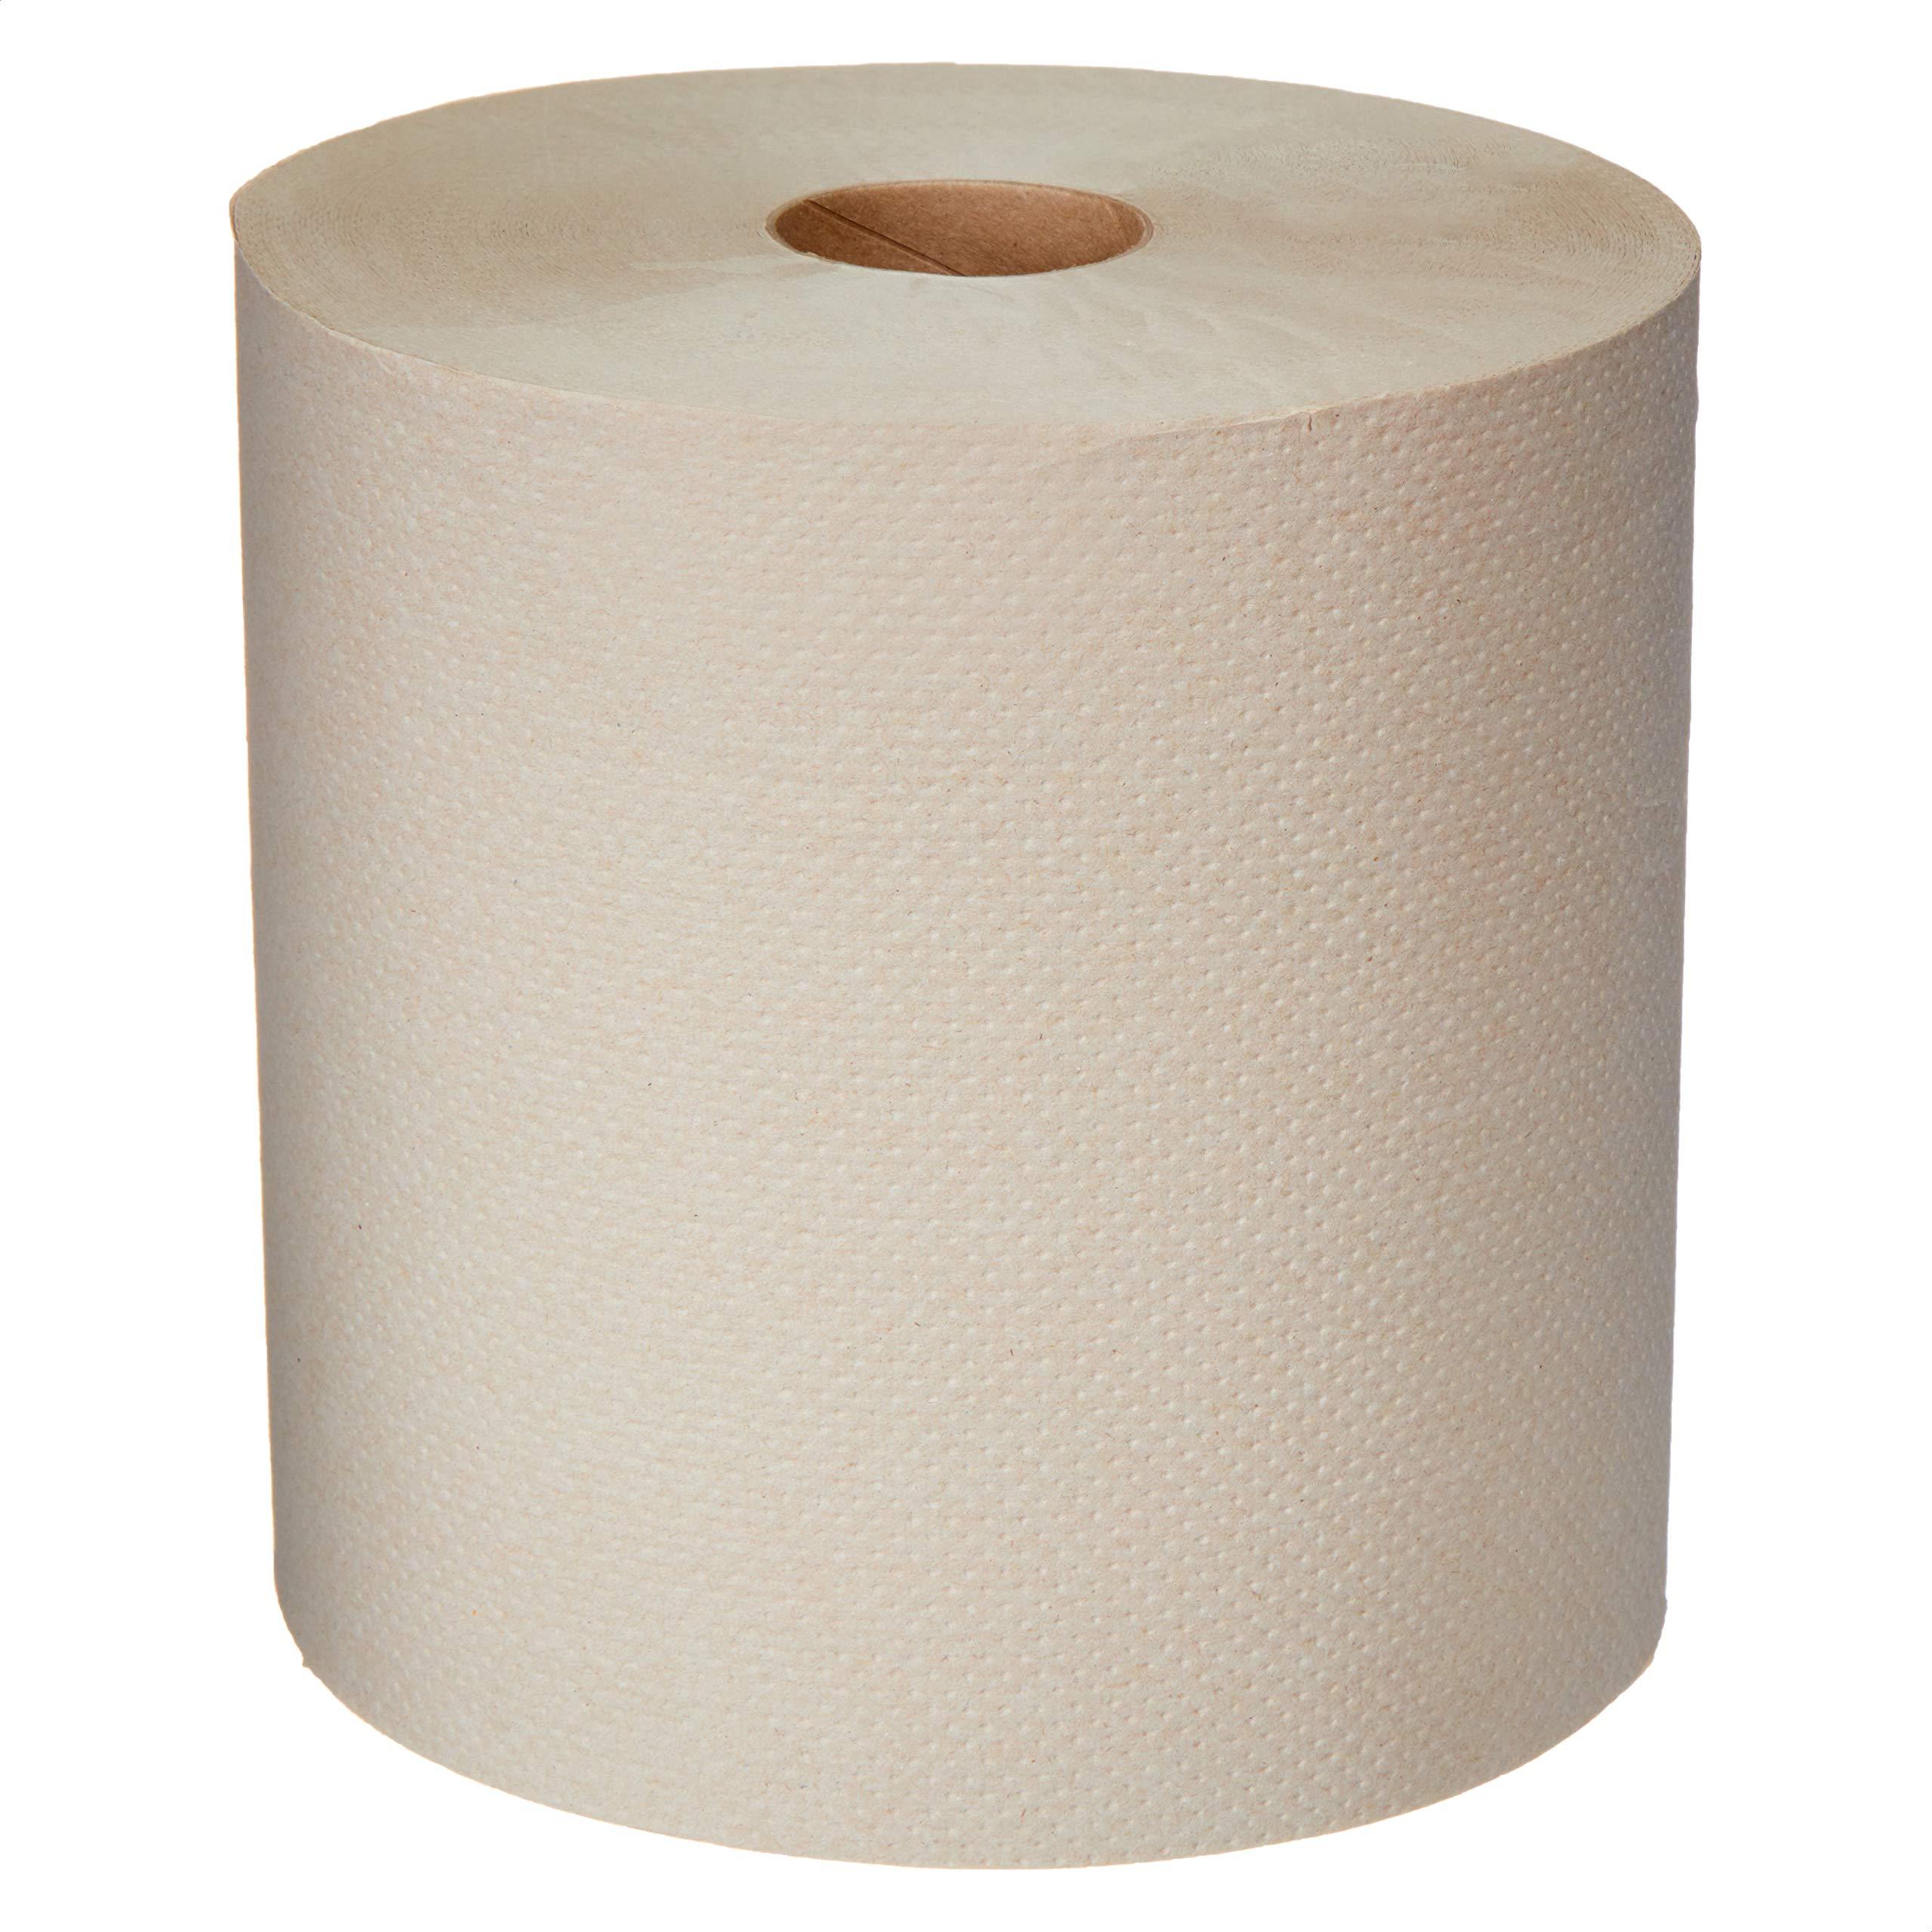 AmazonCommercial Kraft Hard Roll Towels, 800' per Roll, 12 Rolls